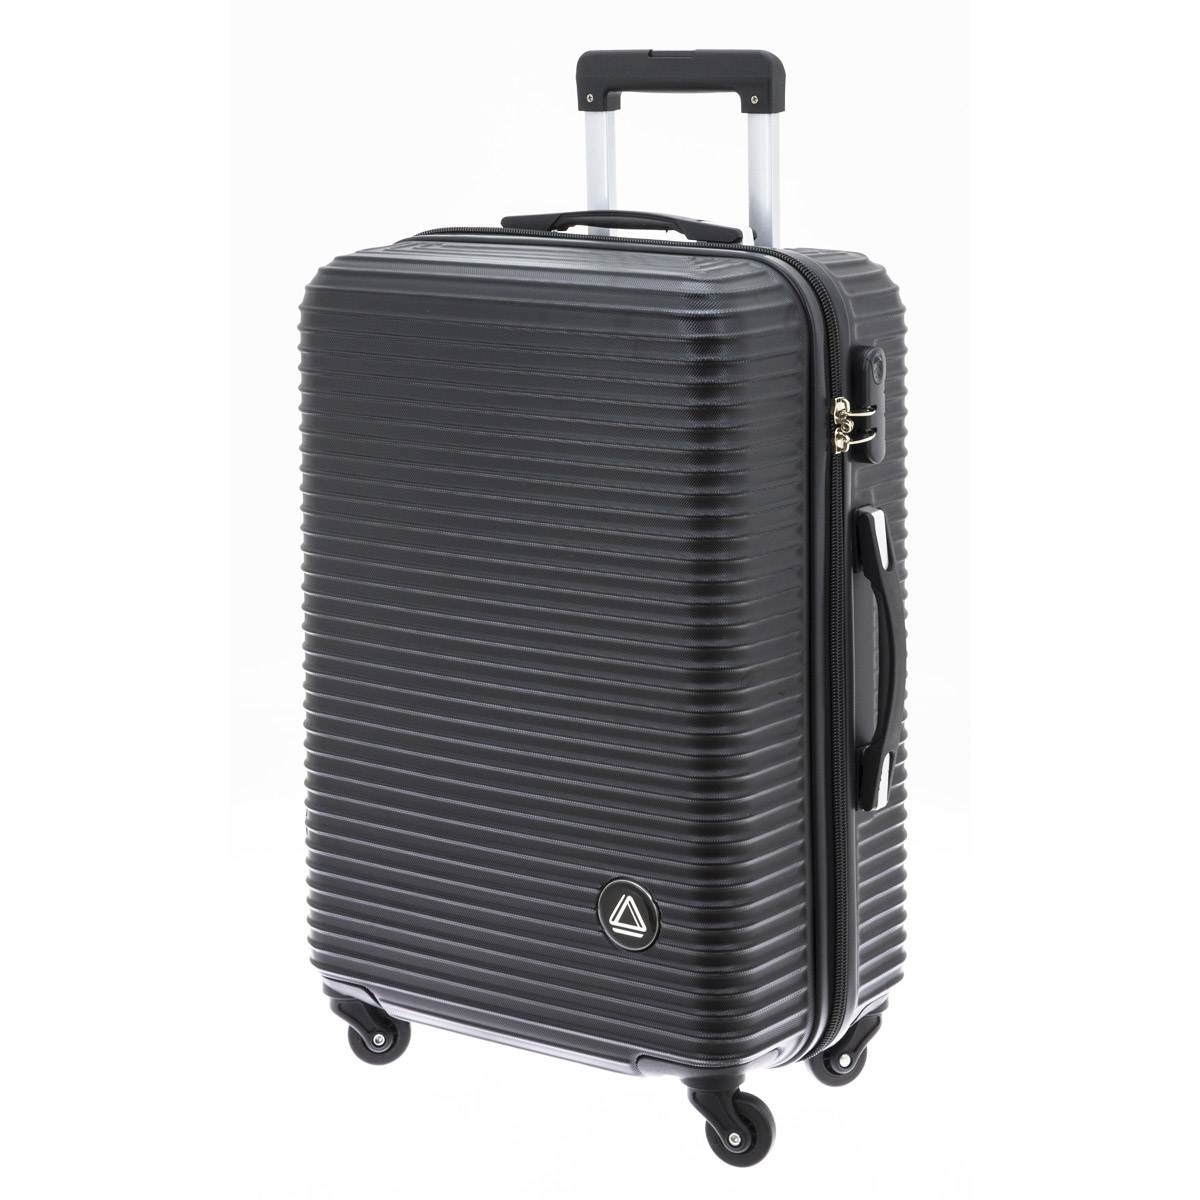 Valise trolley coque ABS \'Davidt\'s\' noir - 65x44x26 cm - [Q9931]